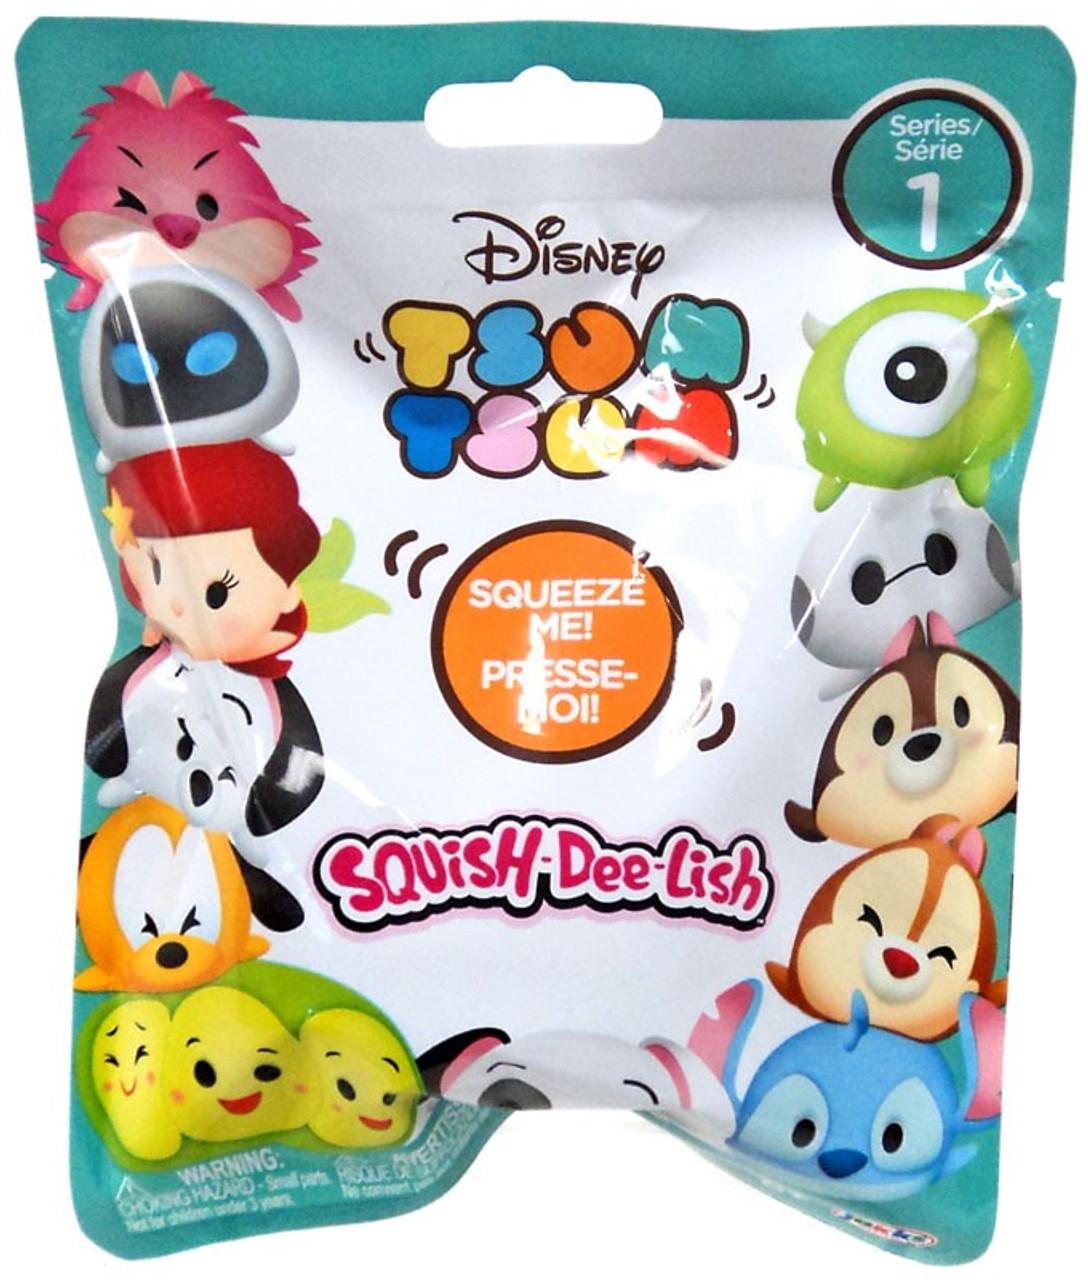 Squish Dee Lish Series 2 List : Disney Squish-Dee-Lish Tsum Tsum Series 1 Tsum Tsum Mystery Pack Jakks Pacific - ToyWiz